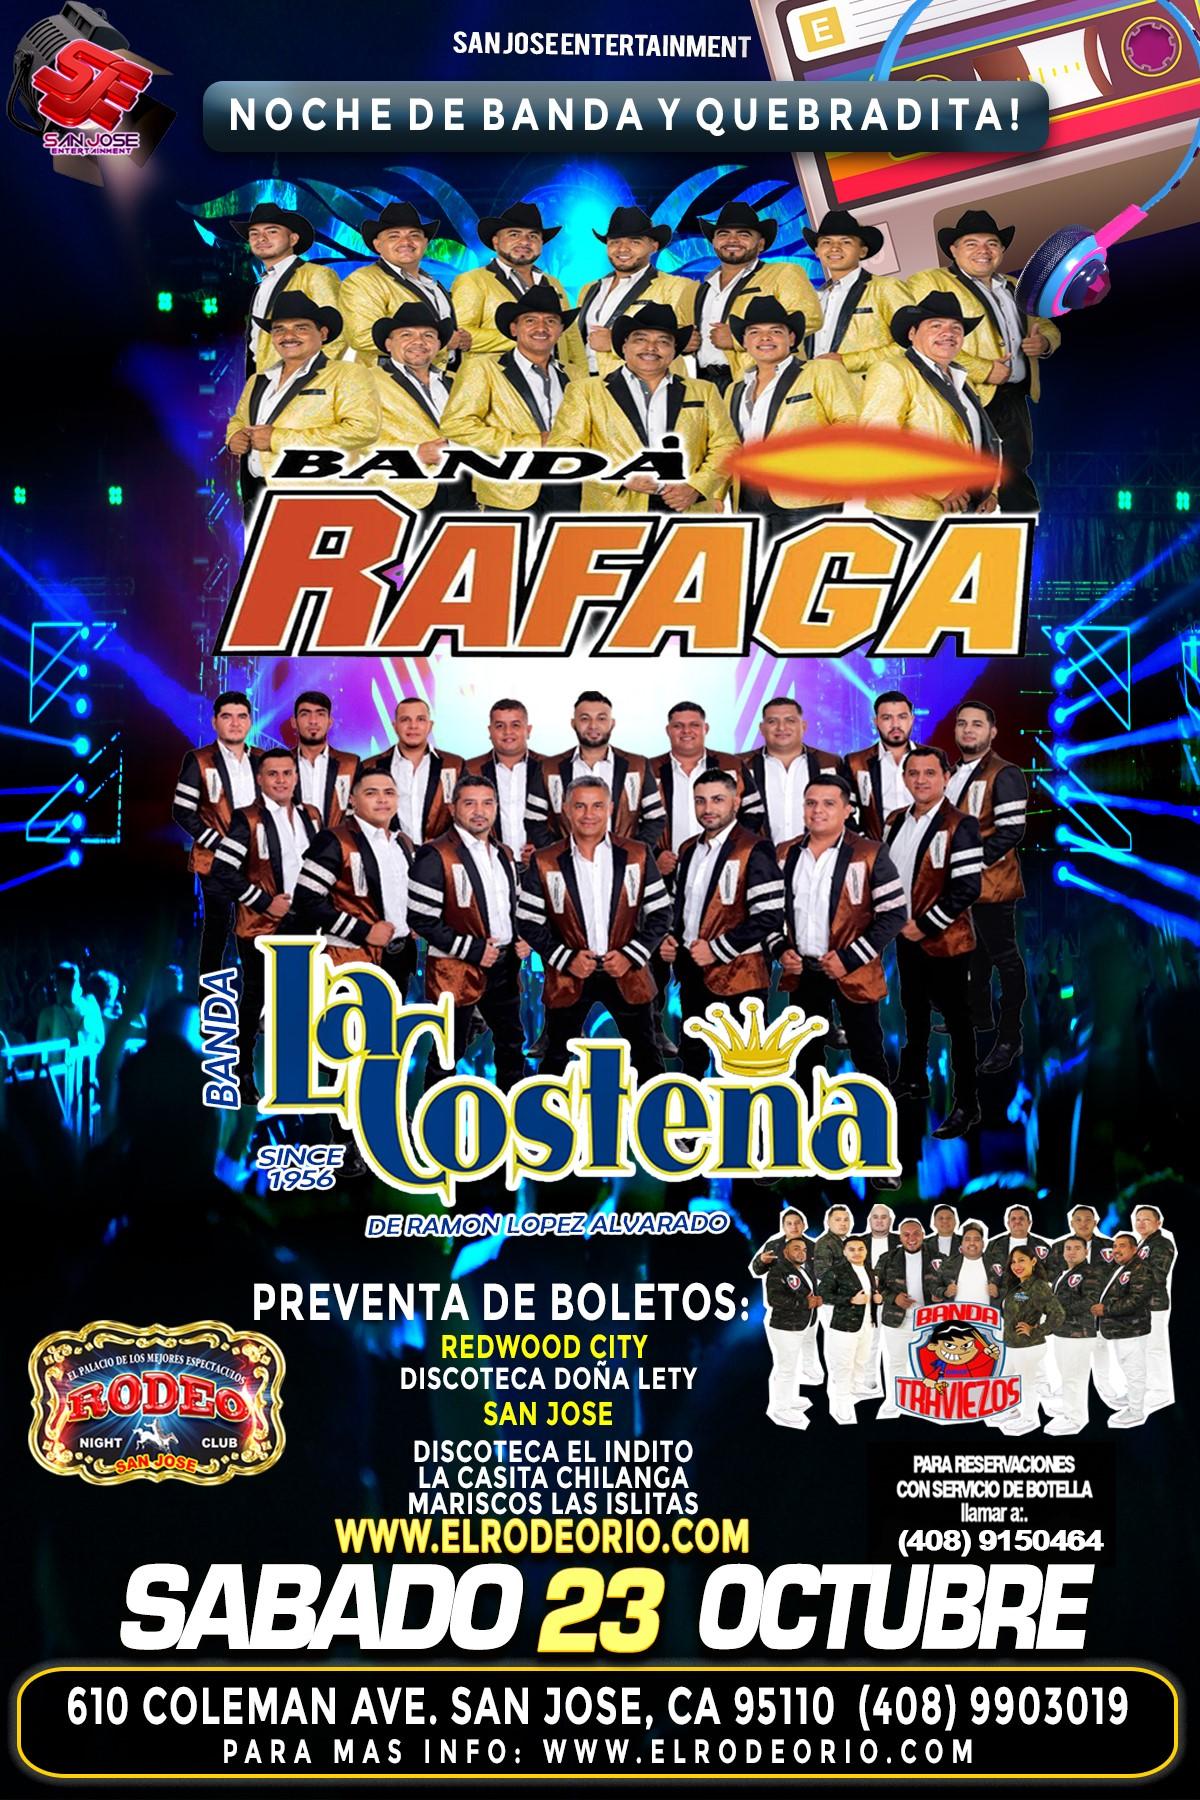 Banda Rafaga,Banda La Costeña,Club Rodeo  on Oct 23, 21:00@Club Rodeo - Buy tickets and Get information on elrodeorio.com sanjoseentertainment